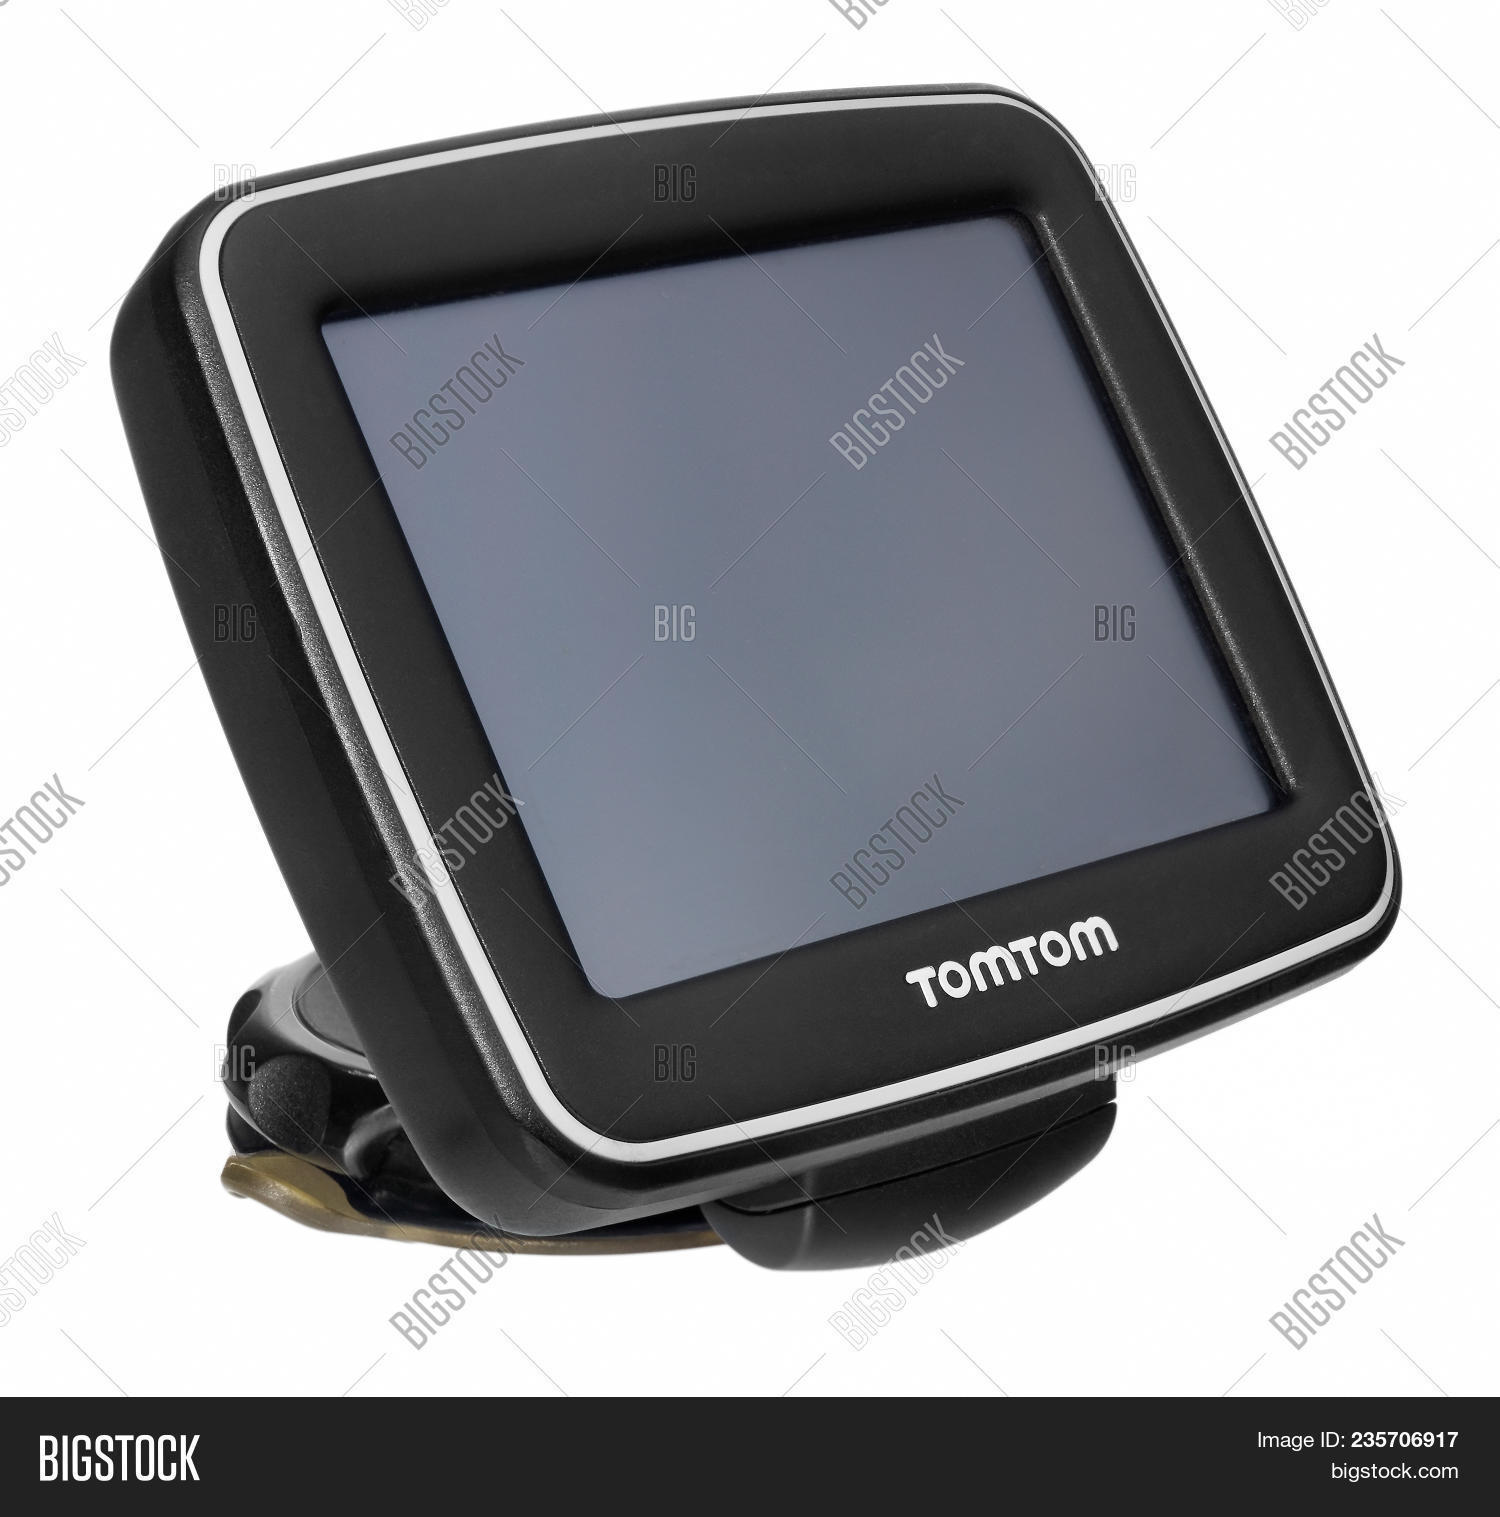 Tomtom Gps Car Image & Photo (Free Trial)   Bigstock